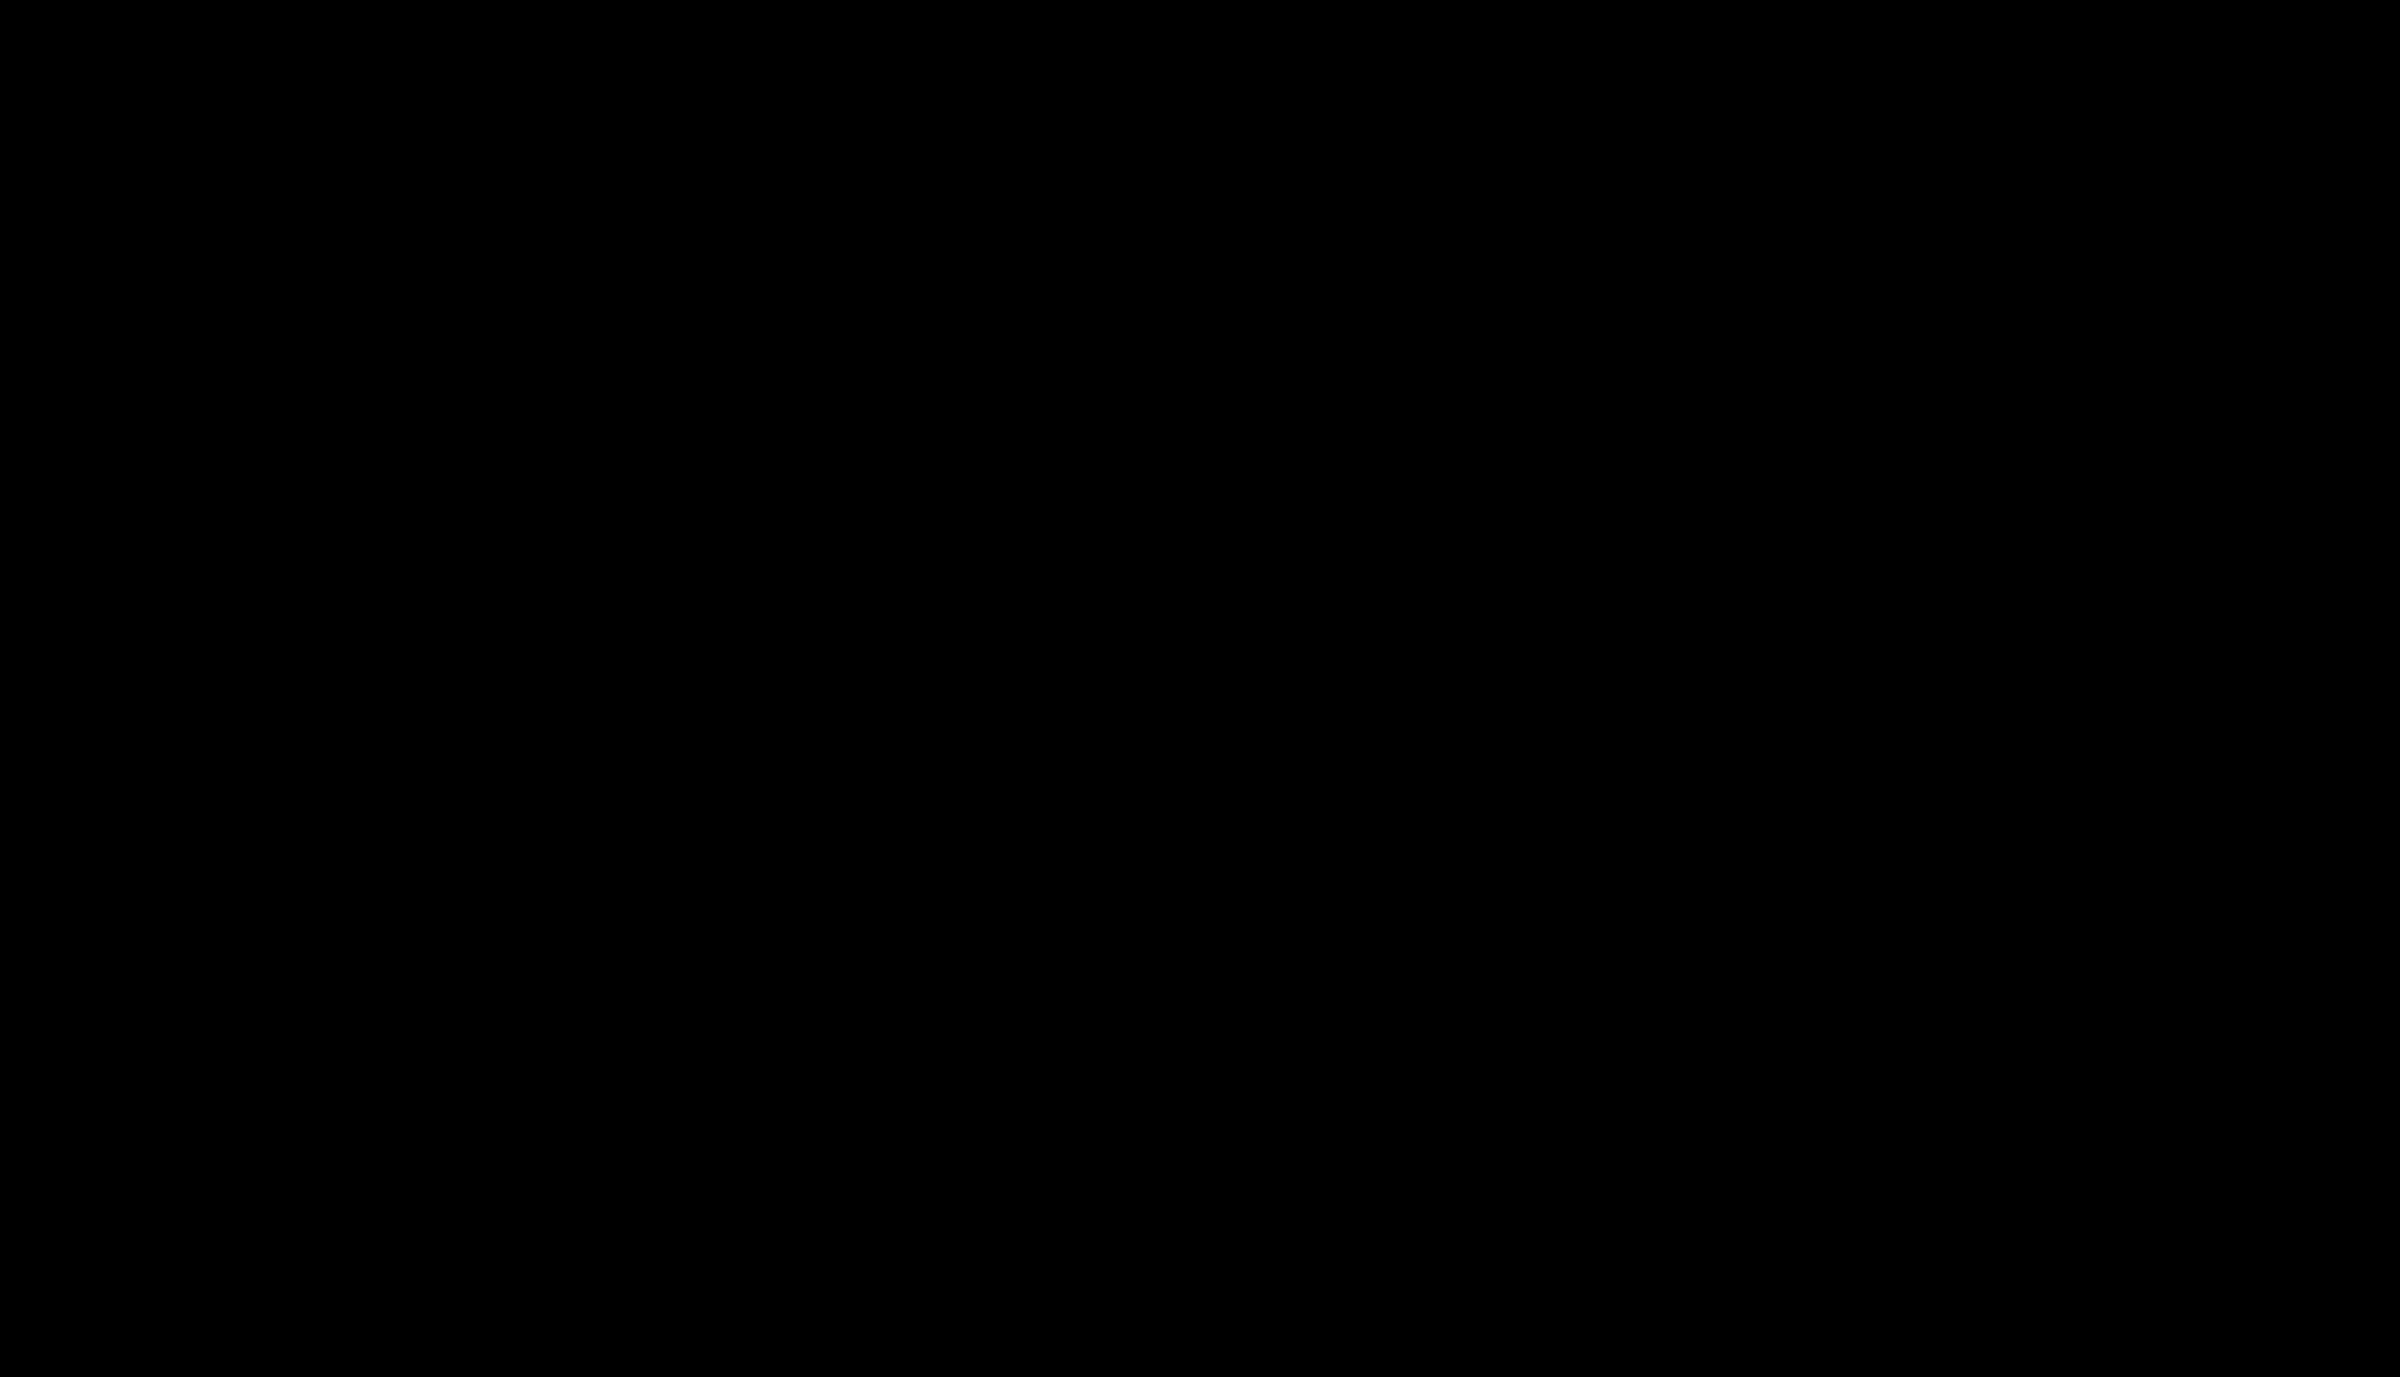 Titanotherium skeleton big image. Geology clipart black and white